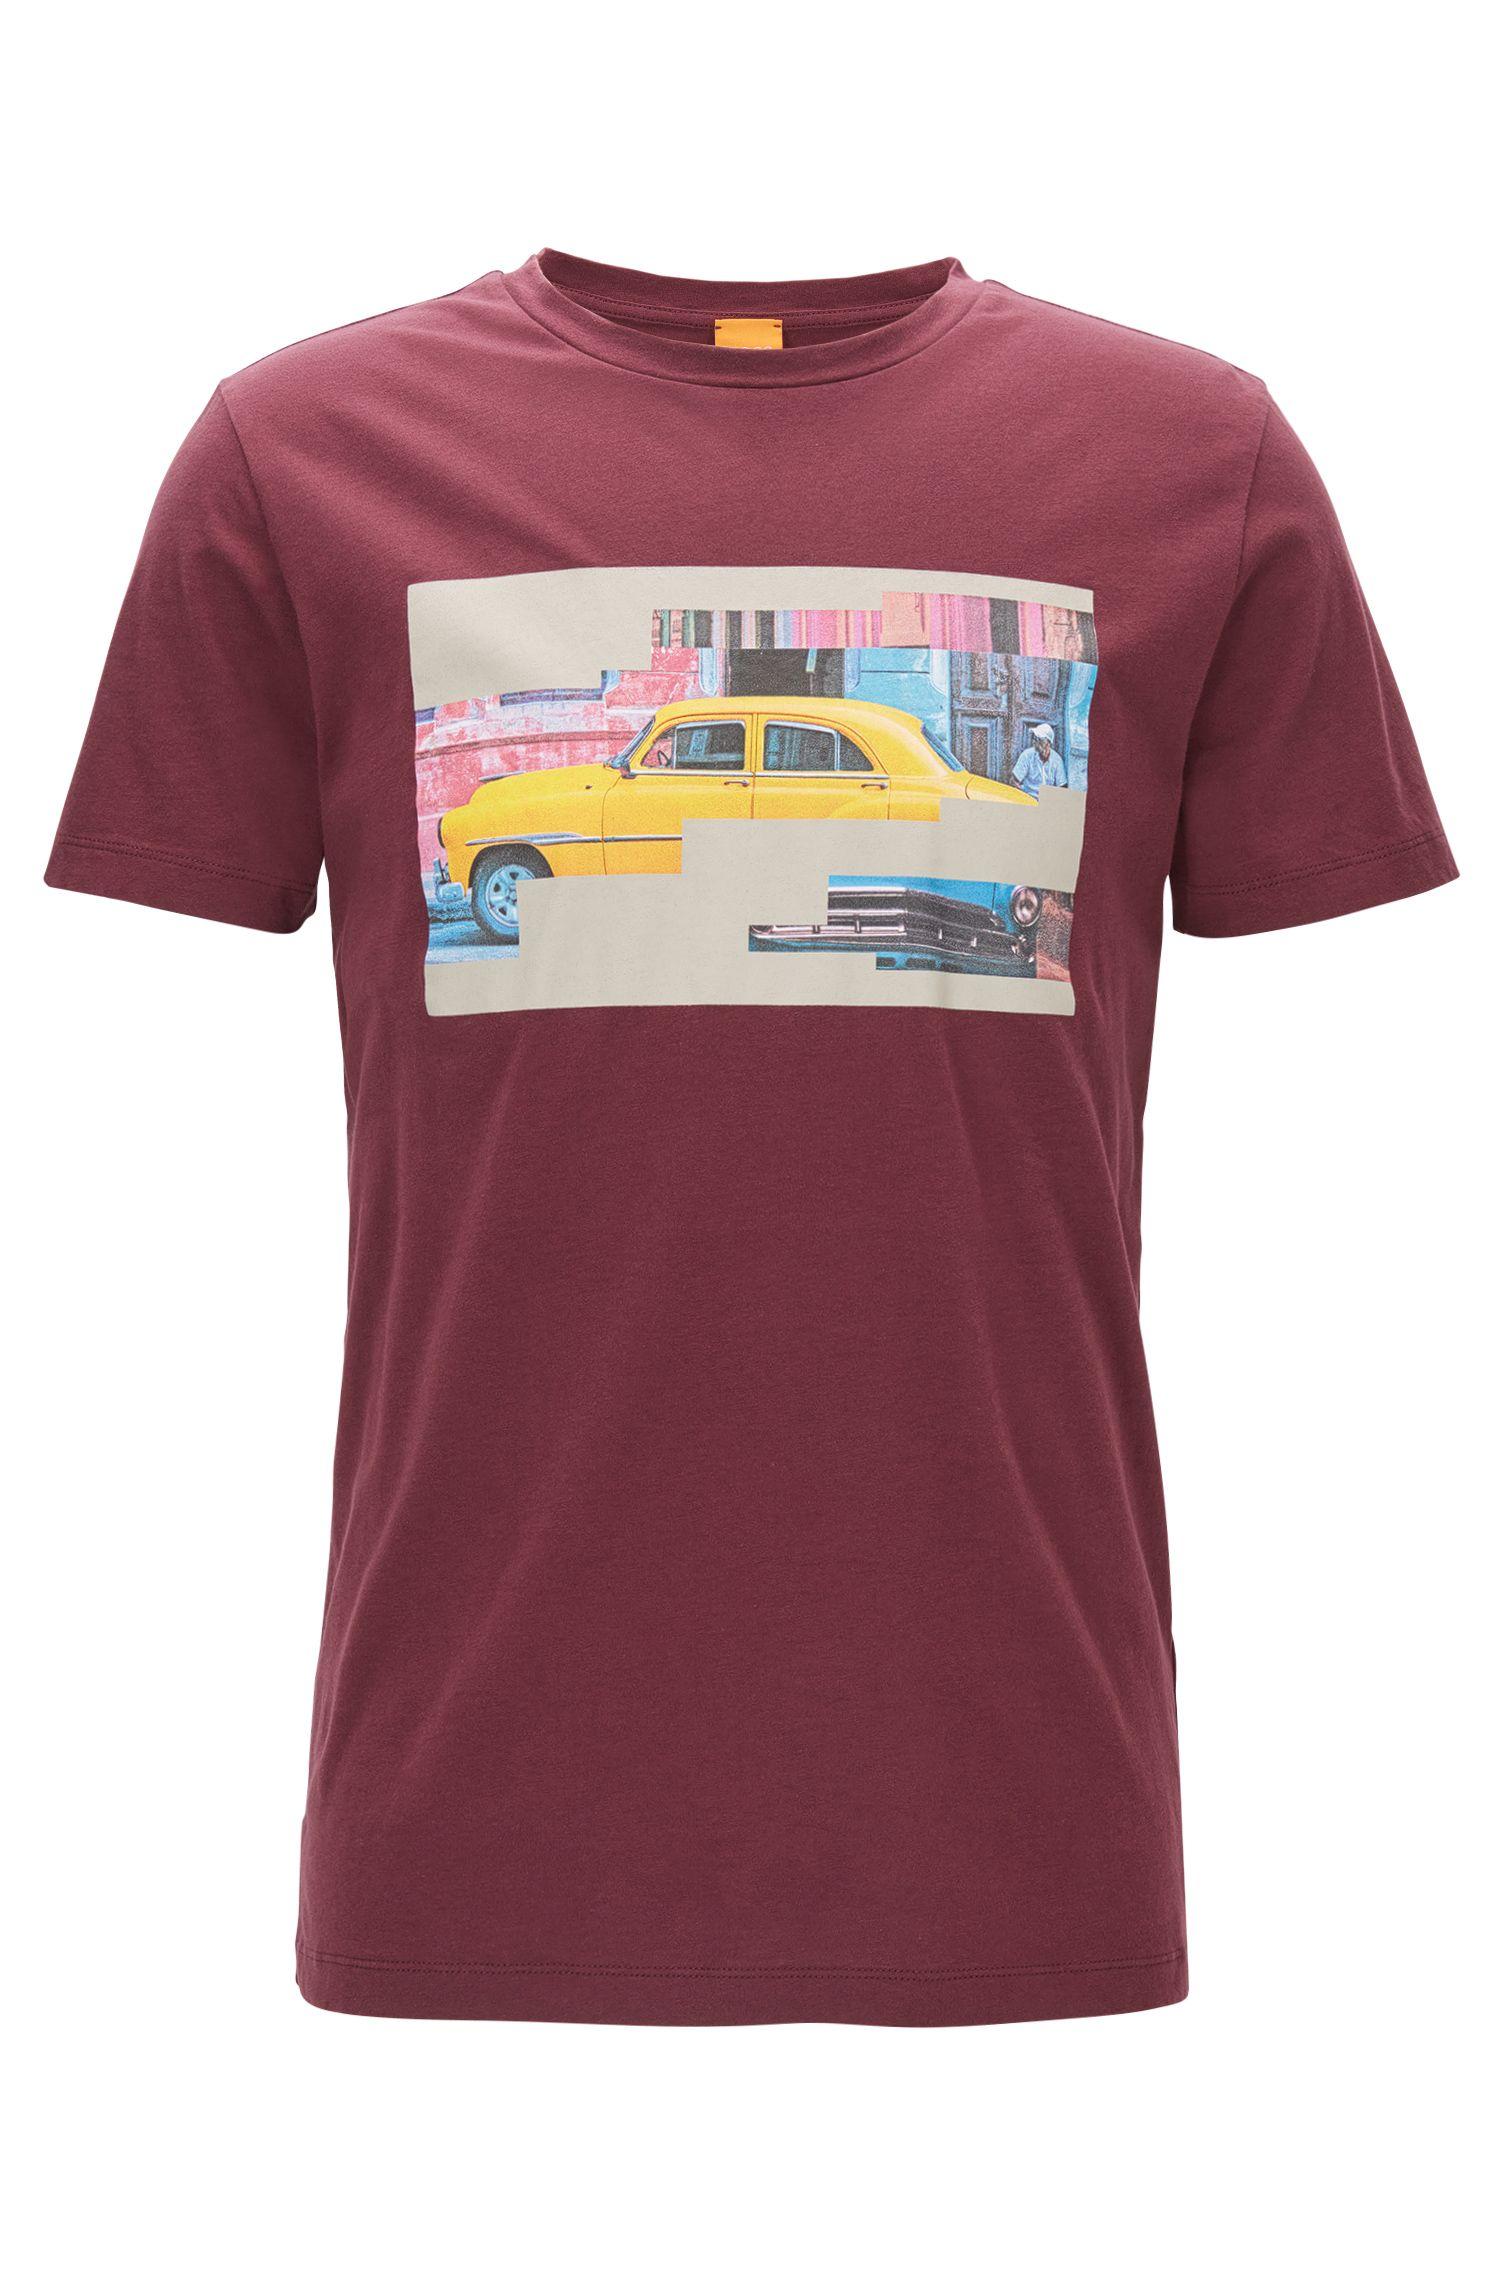 Cuba-Print Graphic T-Shirt | Tux